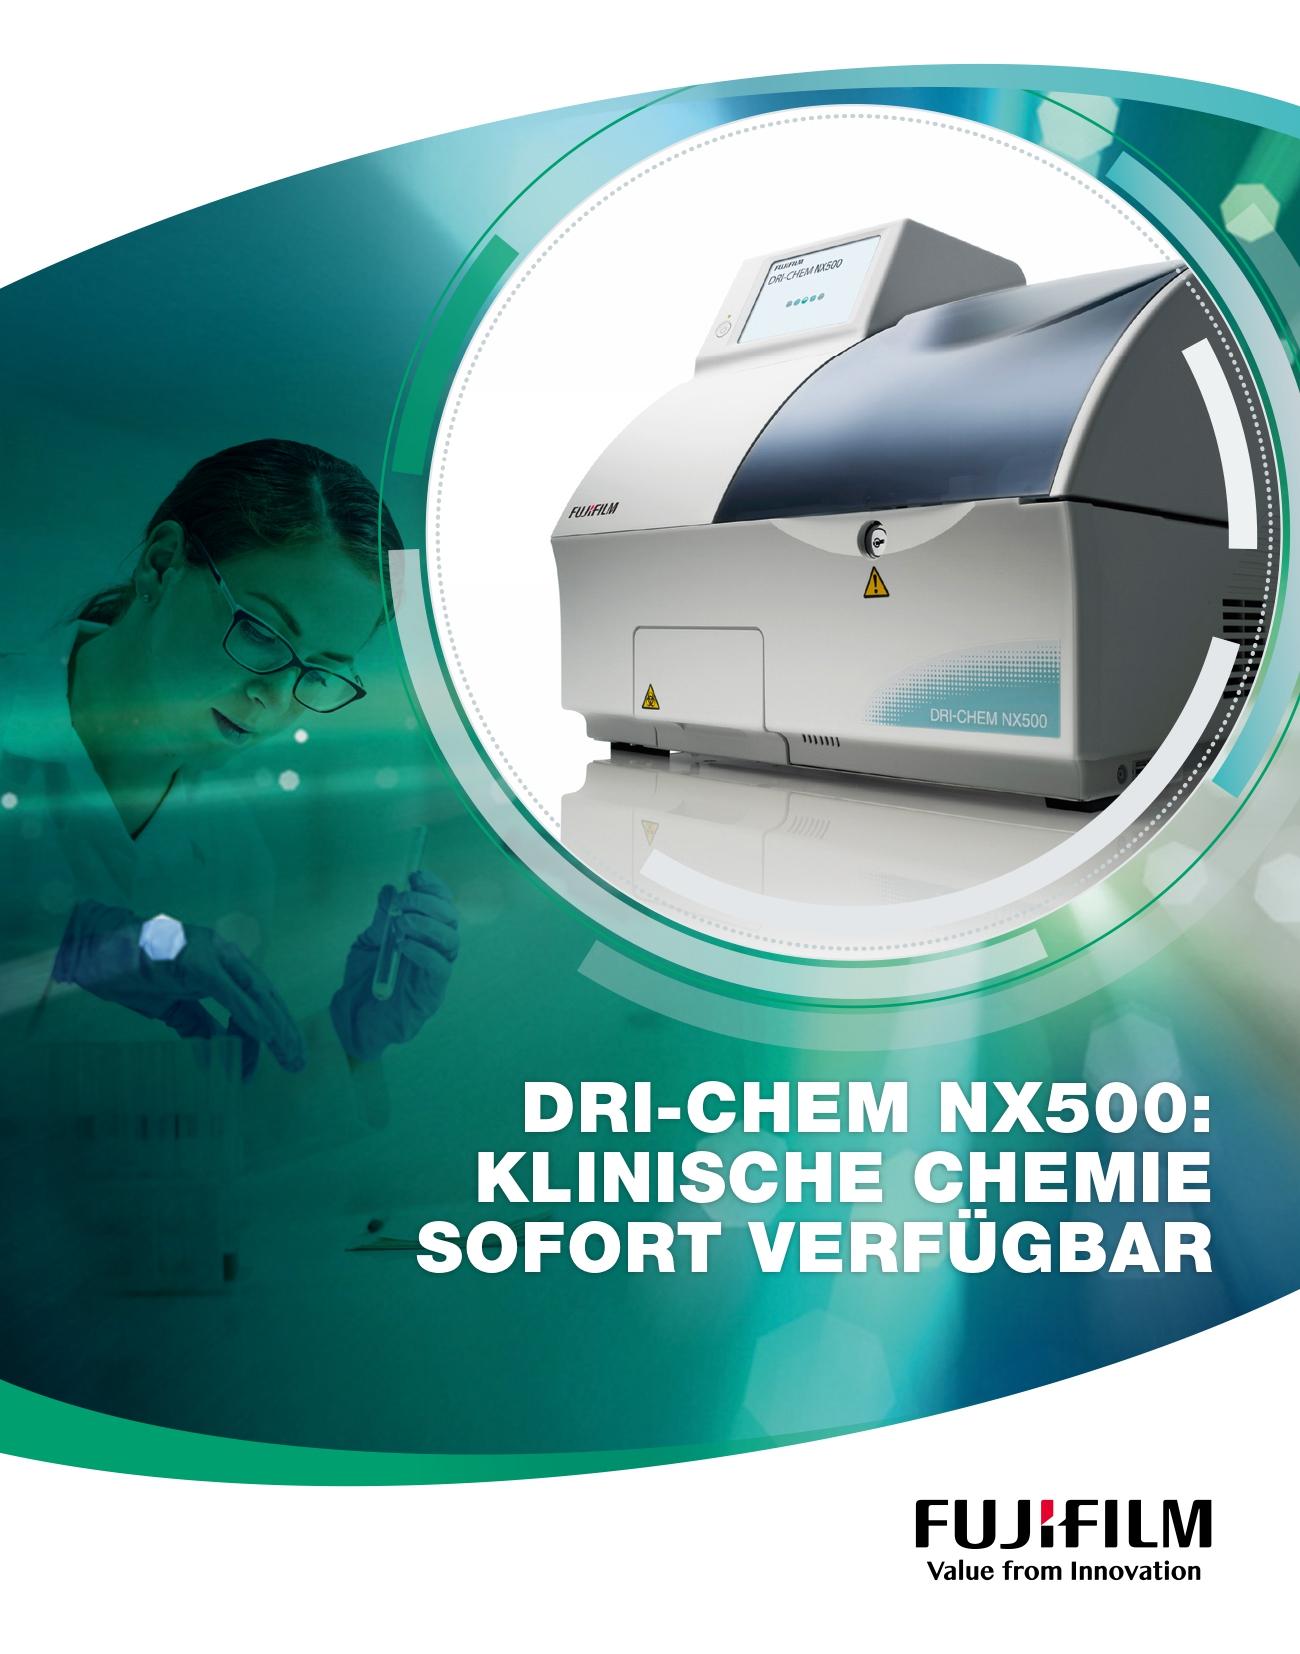 [Foto] FUJIFILM DRI-CHEM NX500 Cover Broschüre